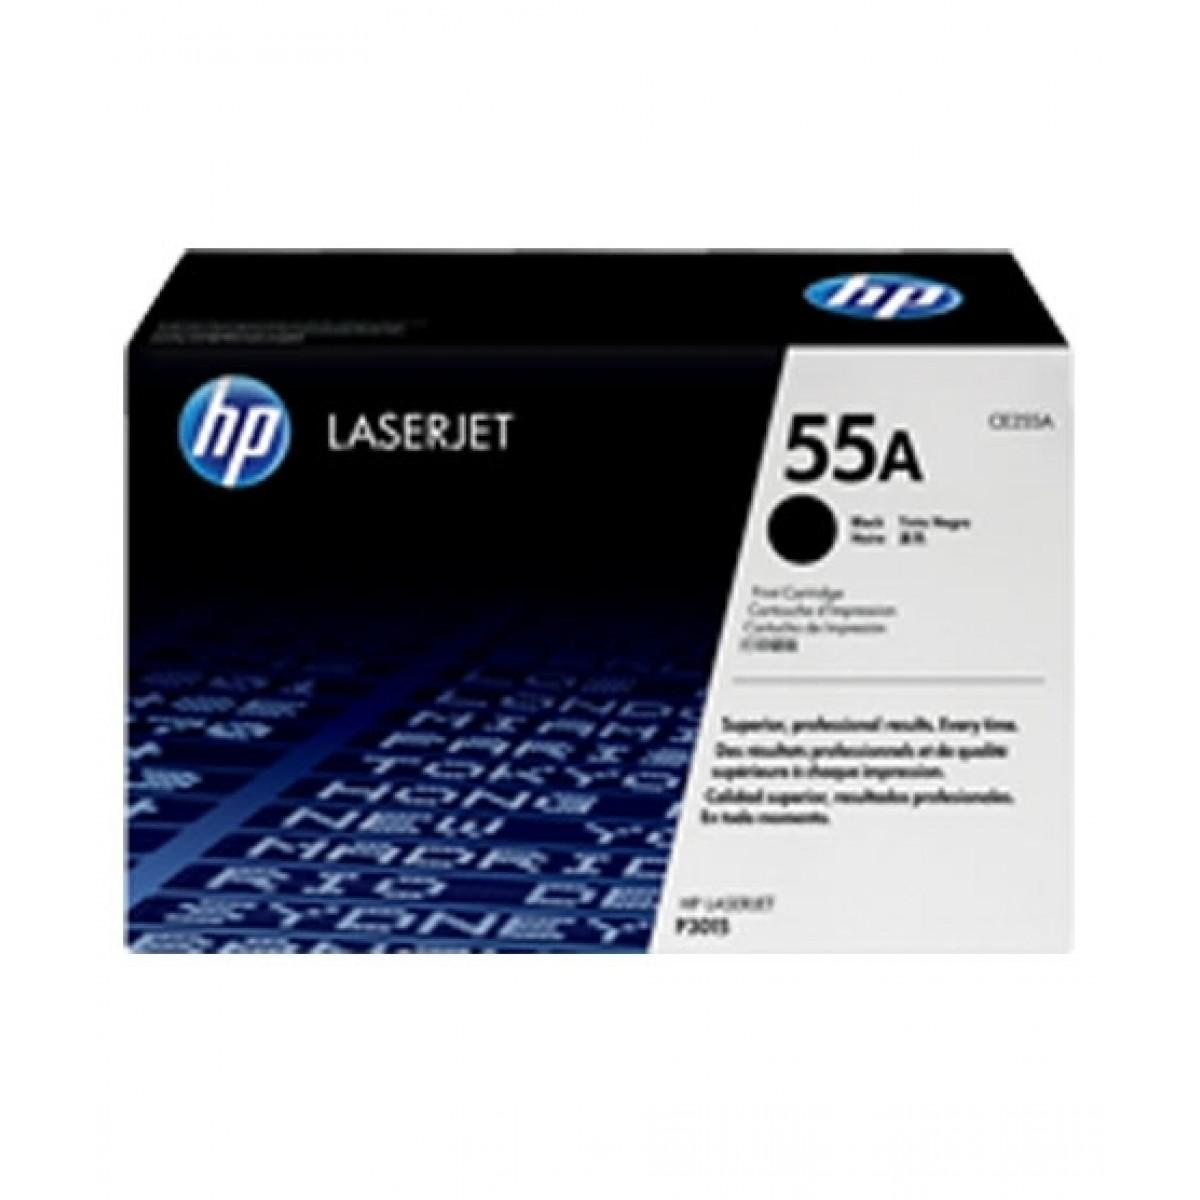 HP 55A LaserJet Toner Cartridge Black (CE255A)